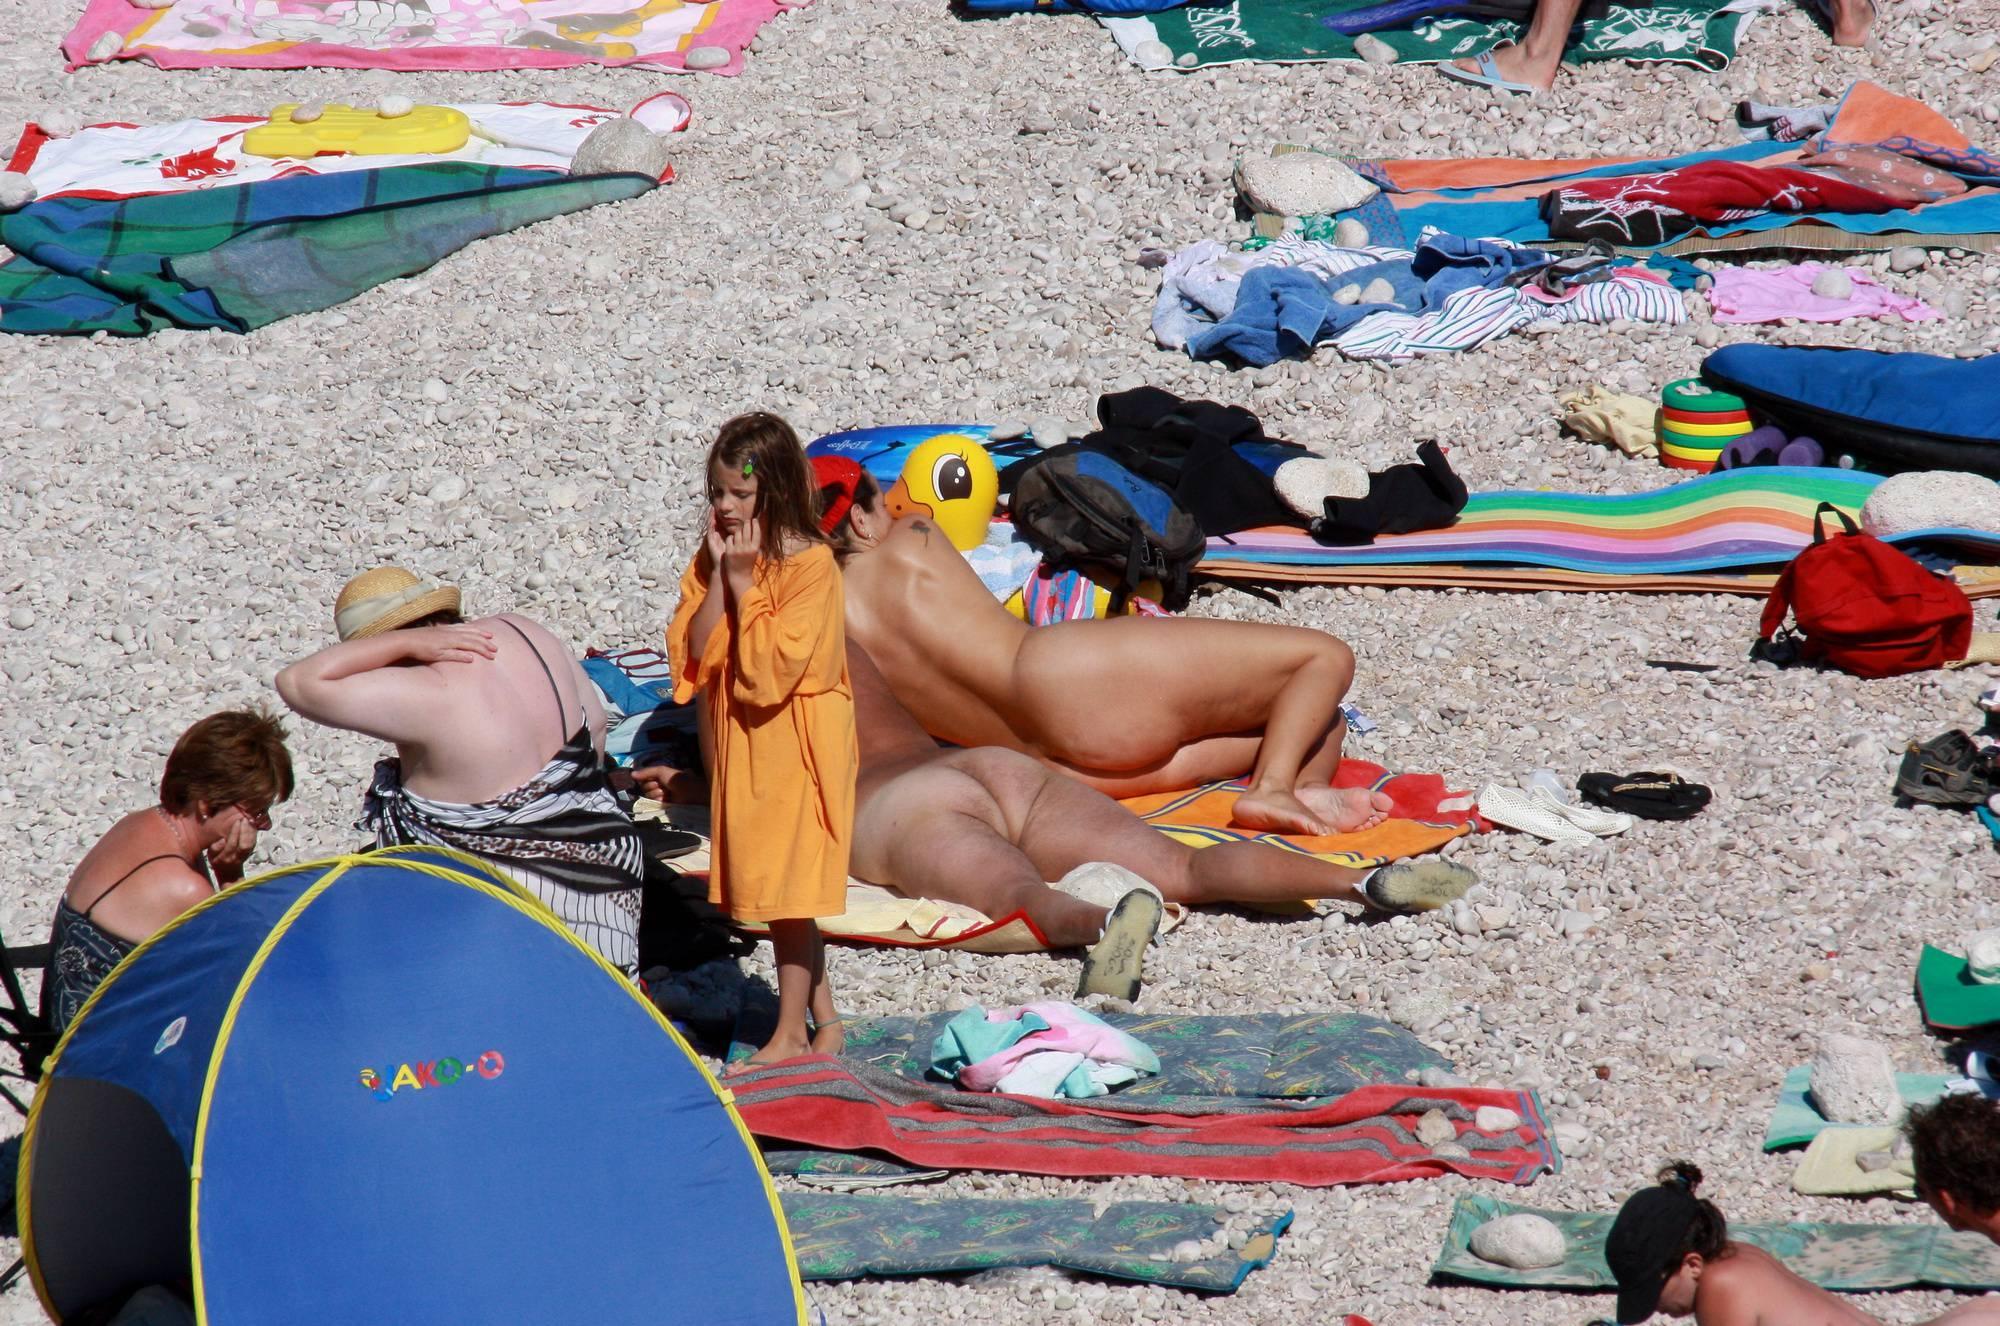 Pure Nudism Photos Nudist Family Beach Look - 1